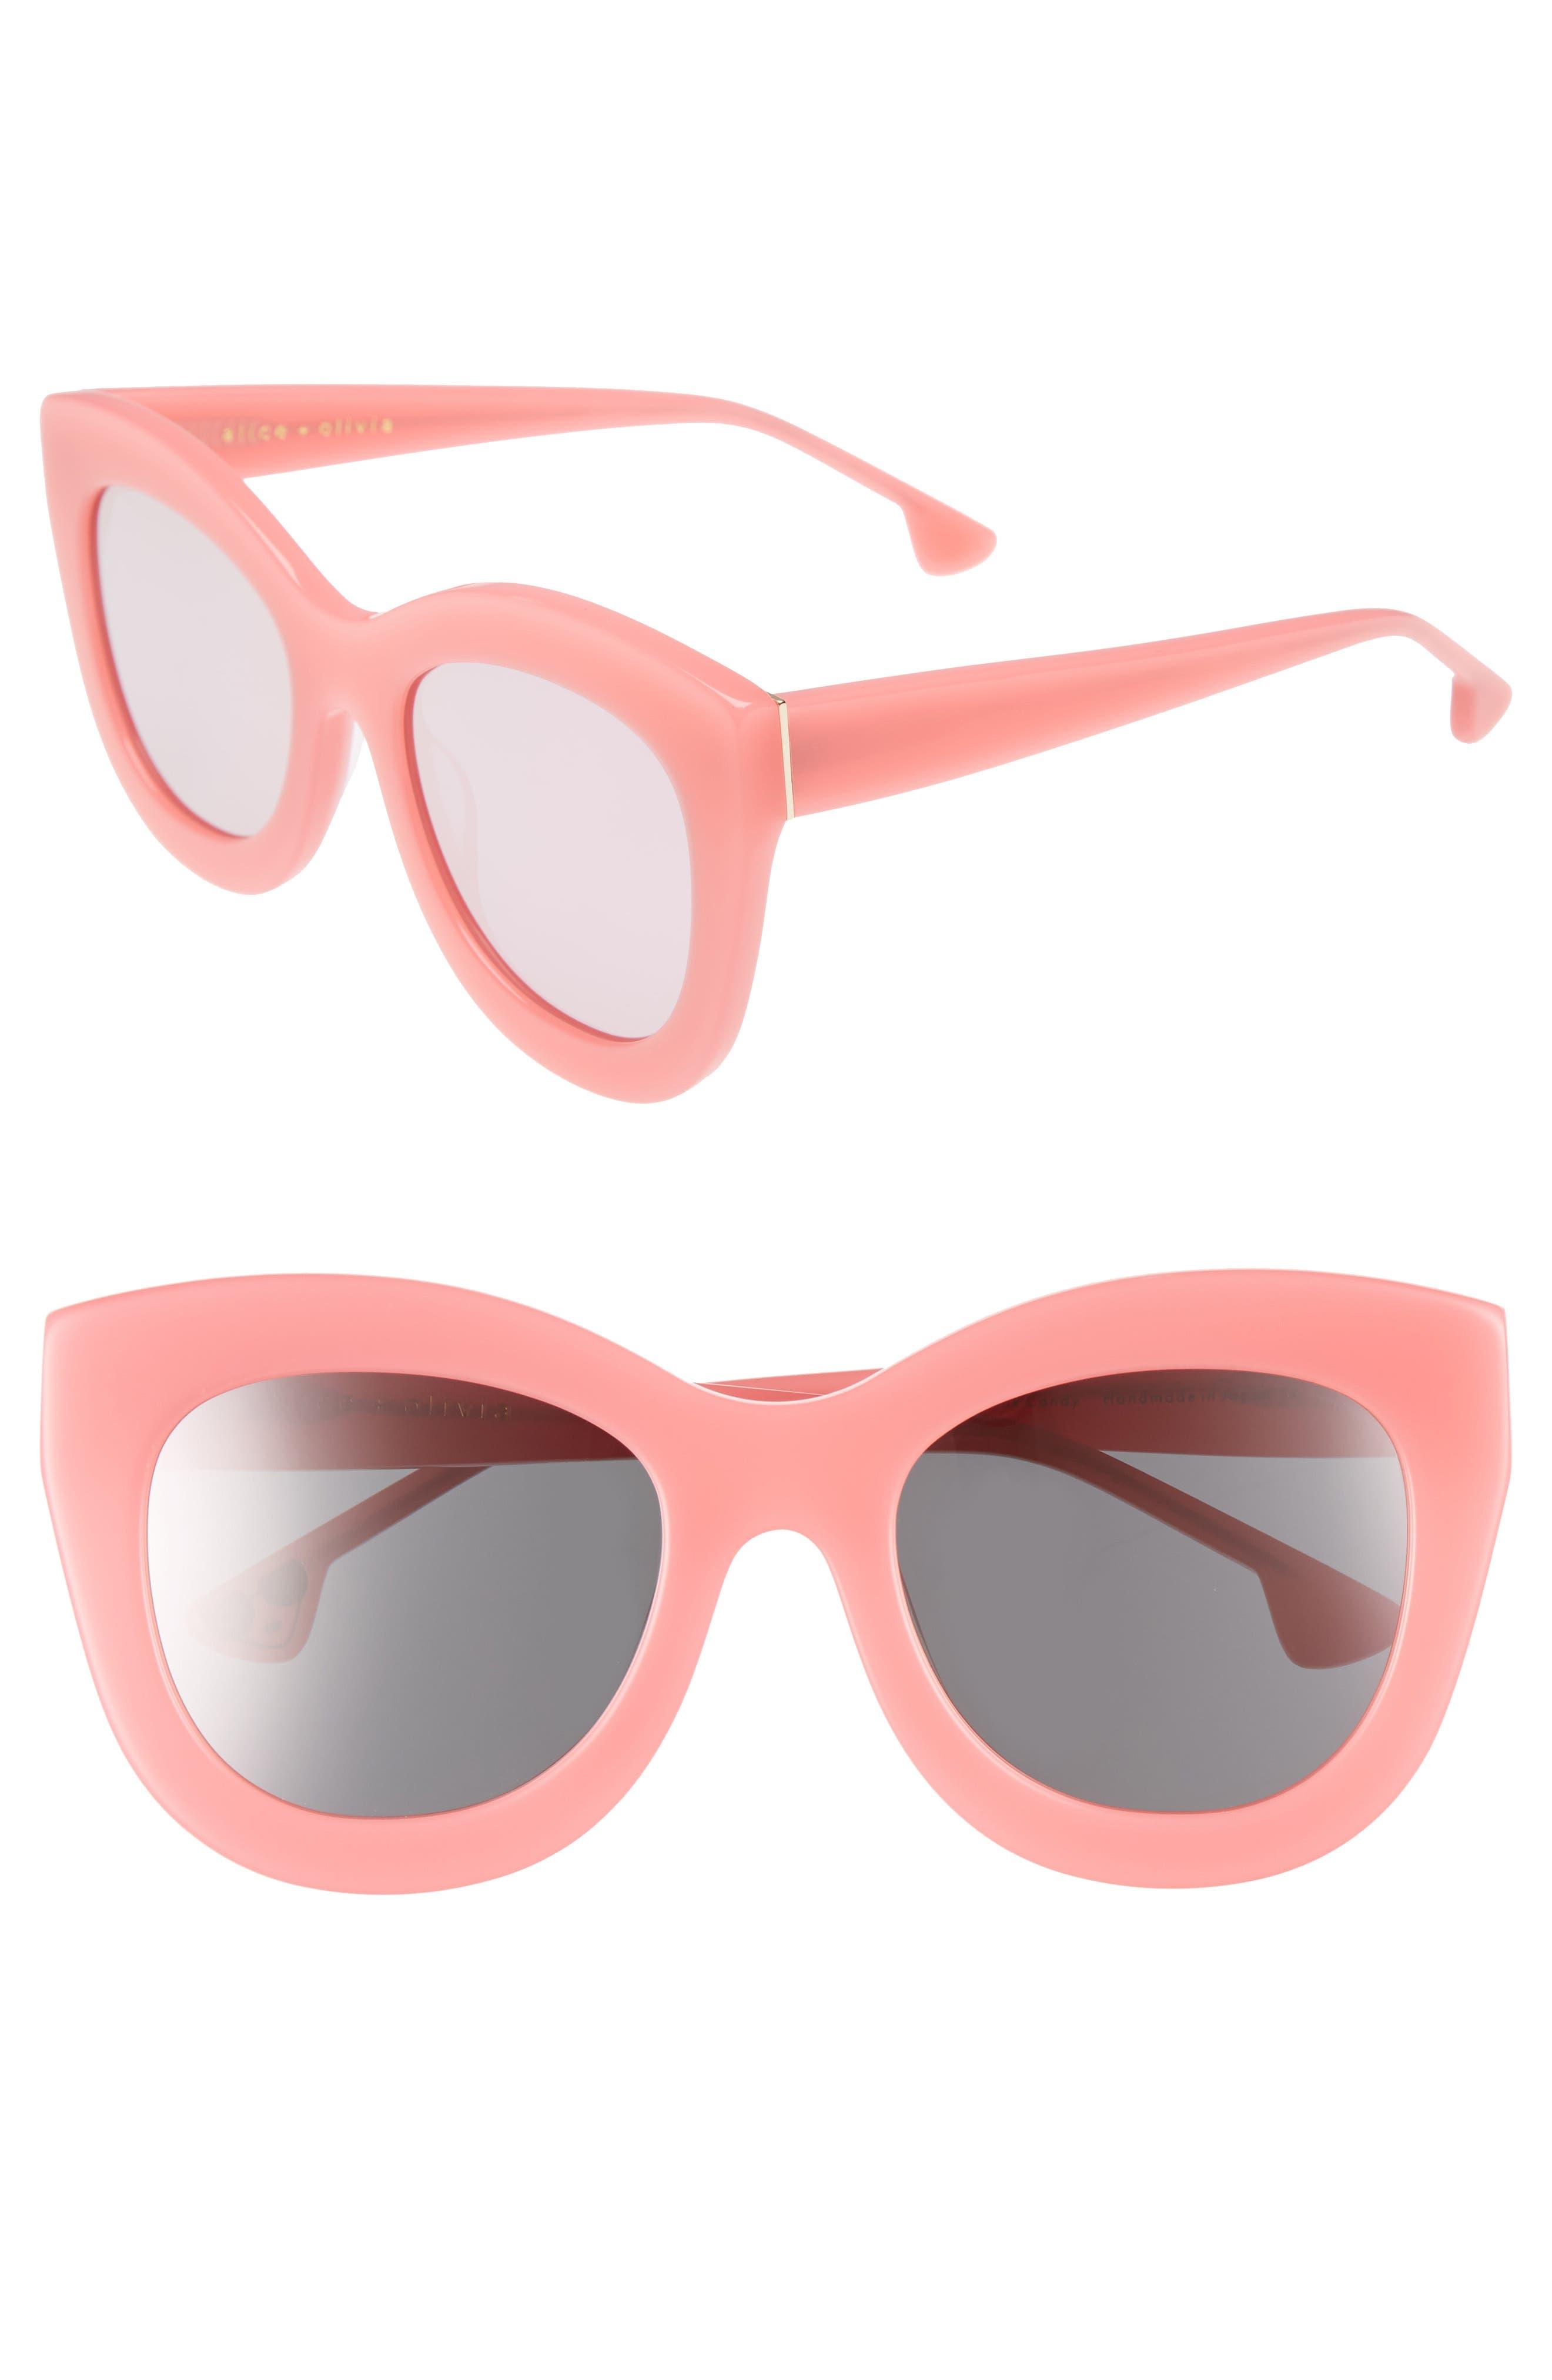 Alice + Olivia Madison 56mm Cat Eye Sunglasses